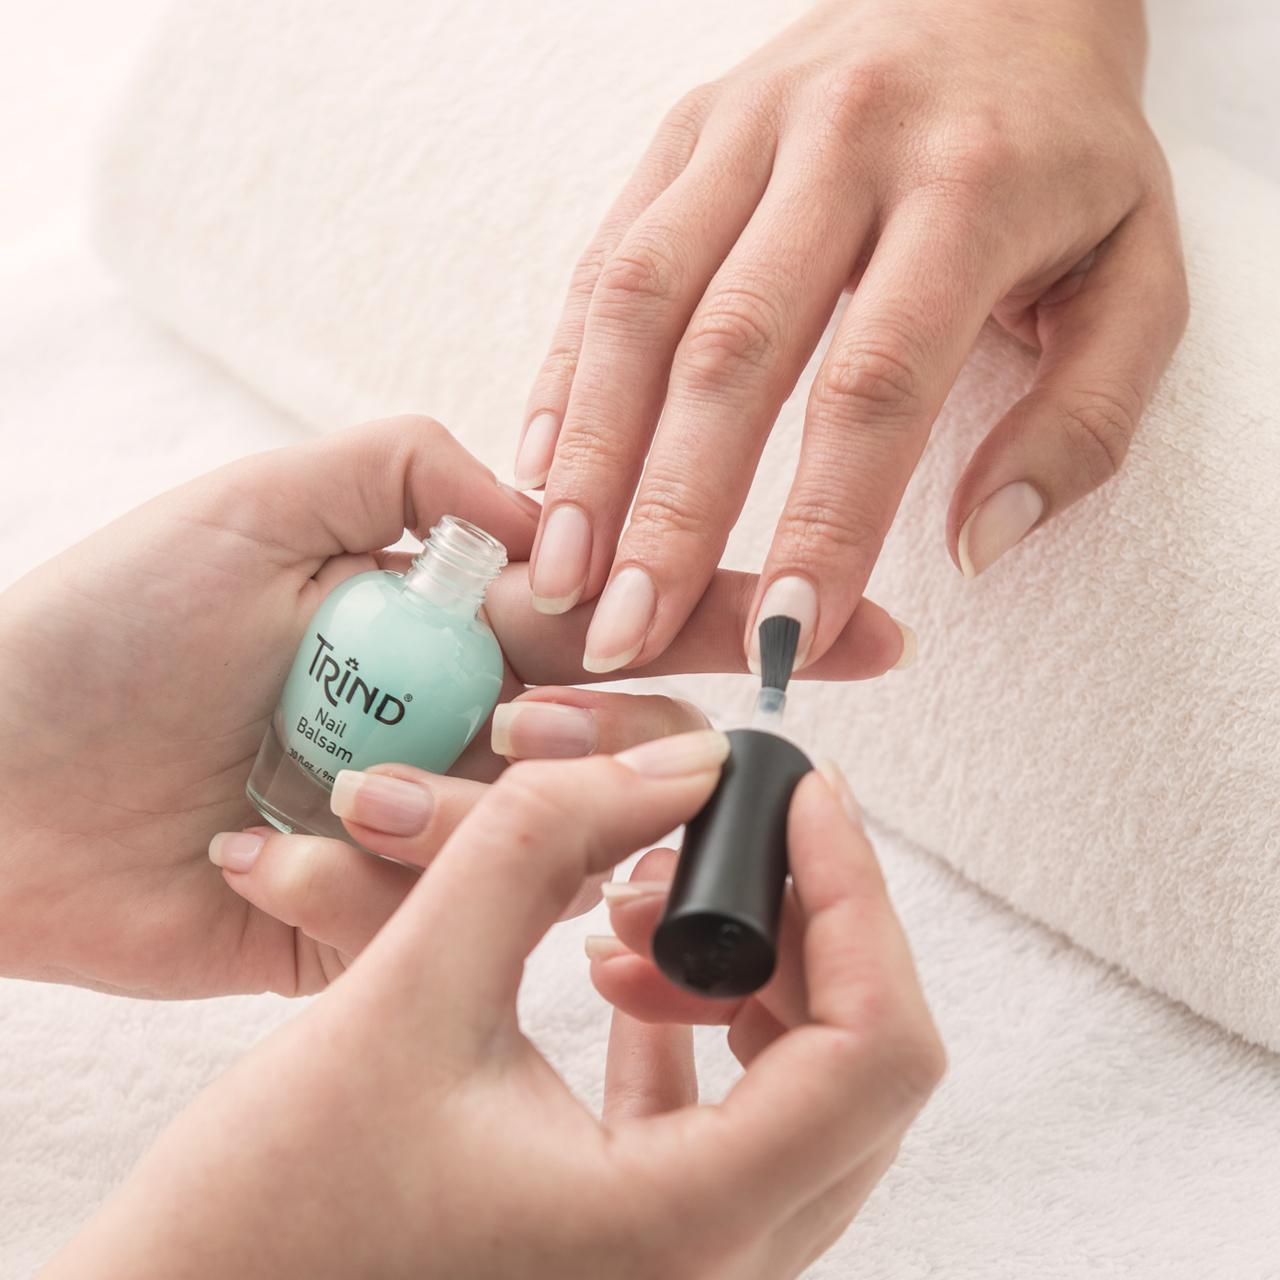 Nail problems - Trind Cosmetics